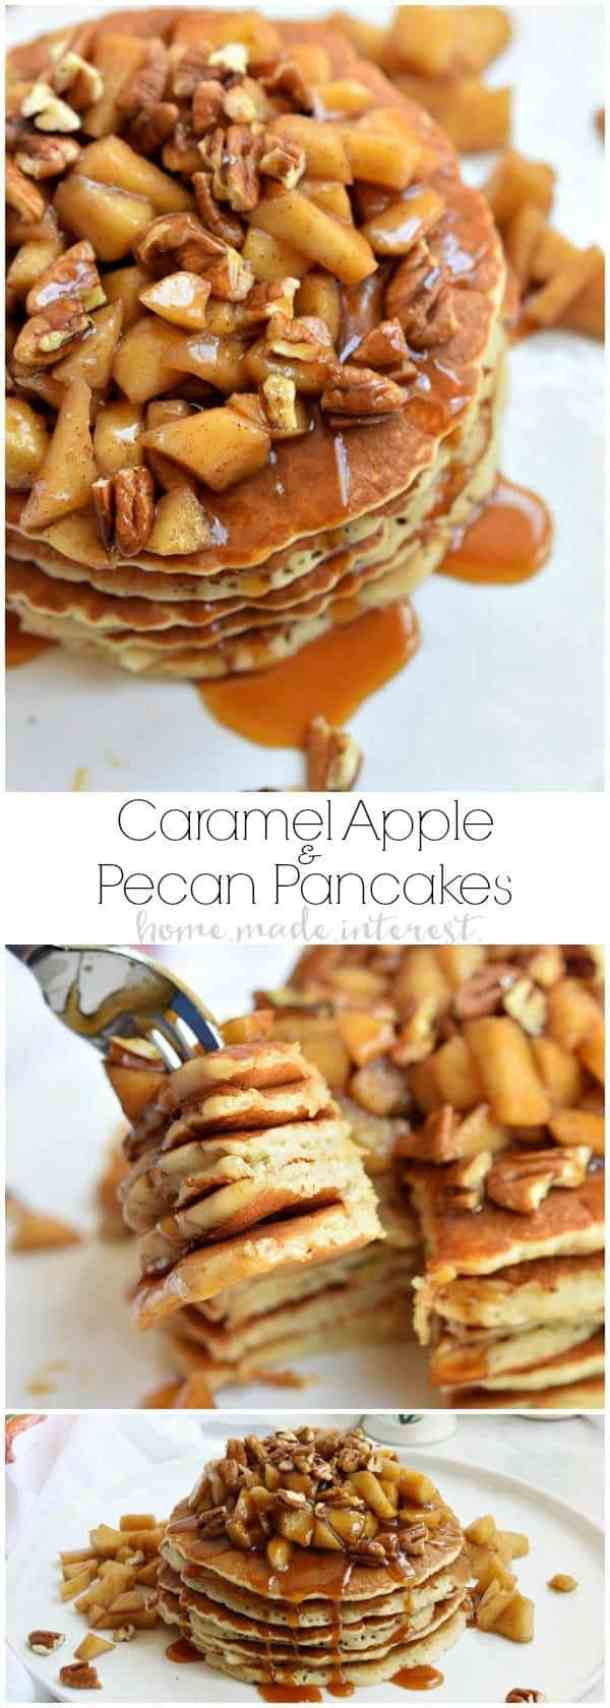 CARAMEL APPLE PECAN PANCAKES -- part of 21+ Pecan Recipes Perfect for Fall Baking